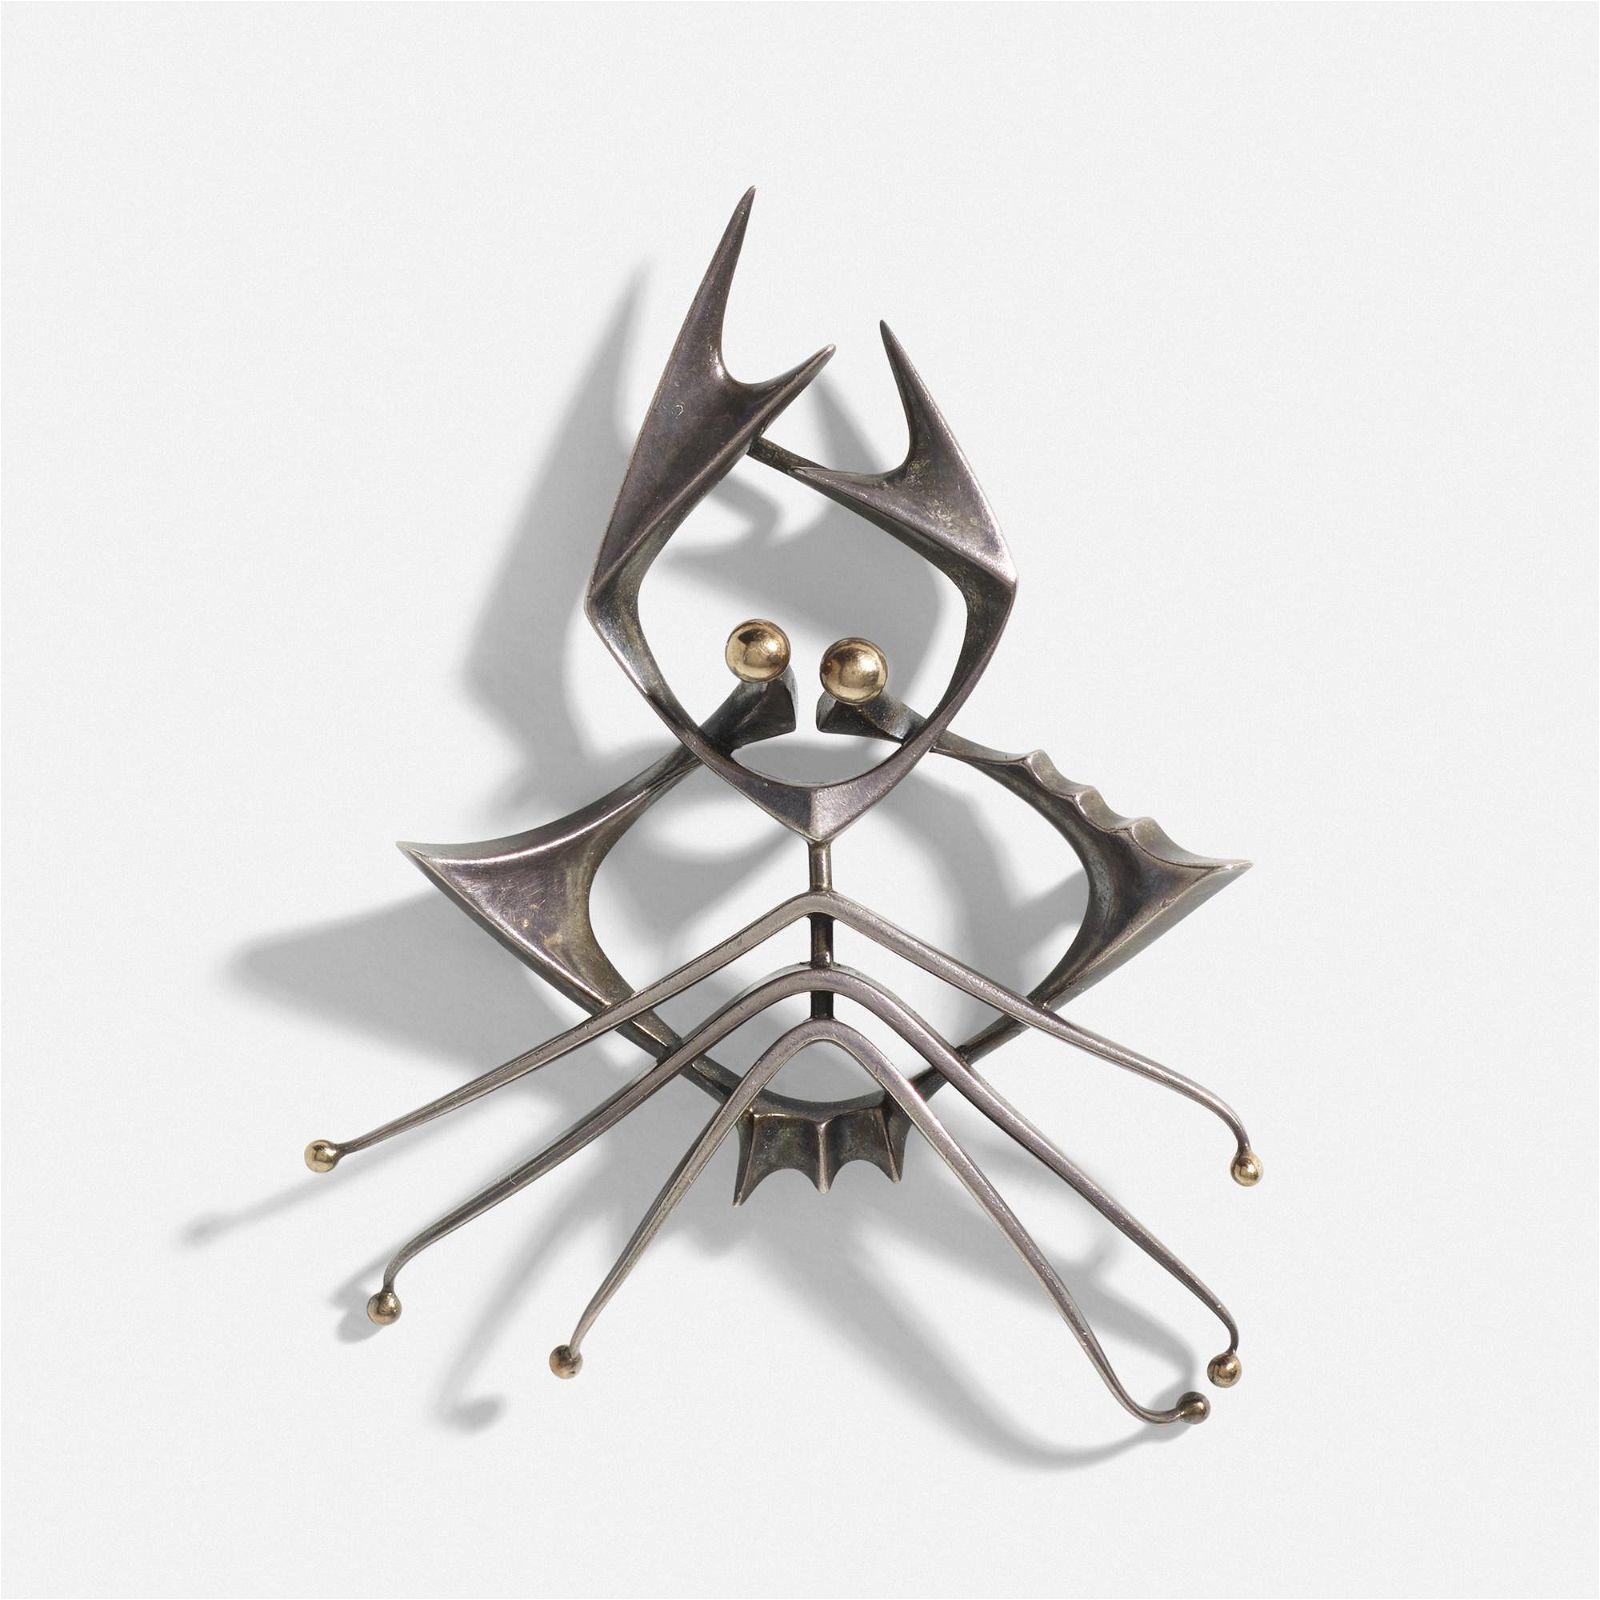 John Prip, Crab brooch